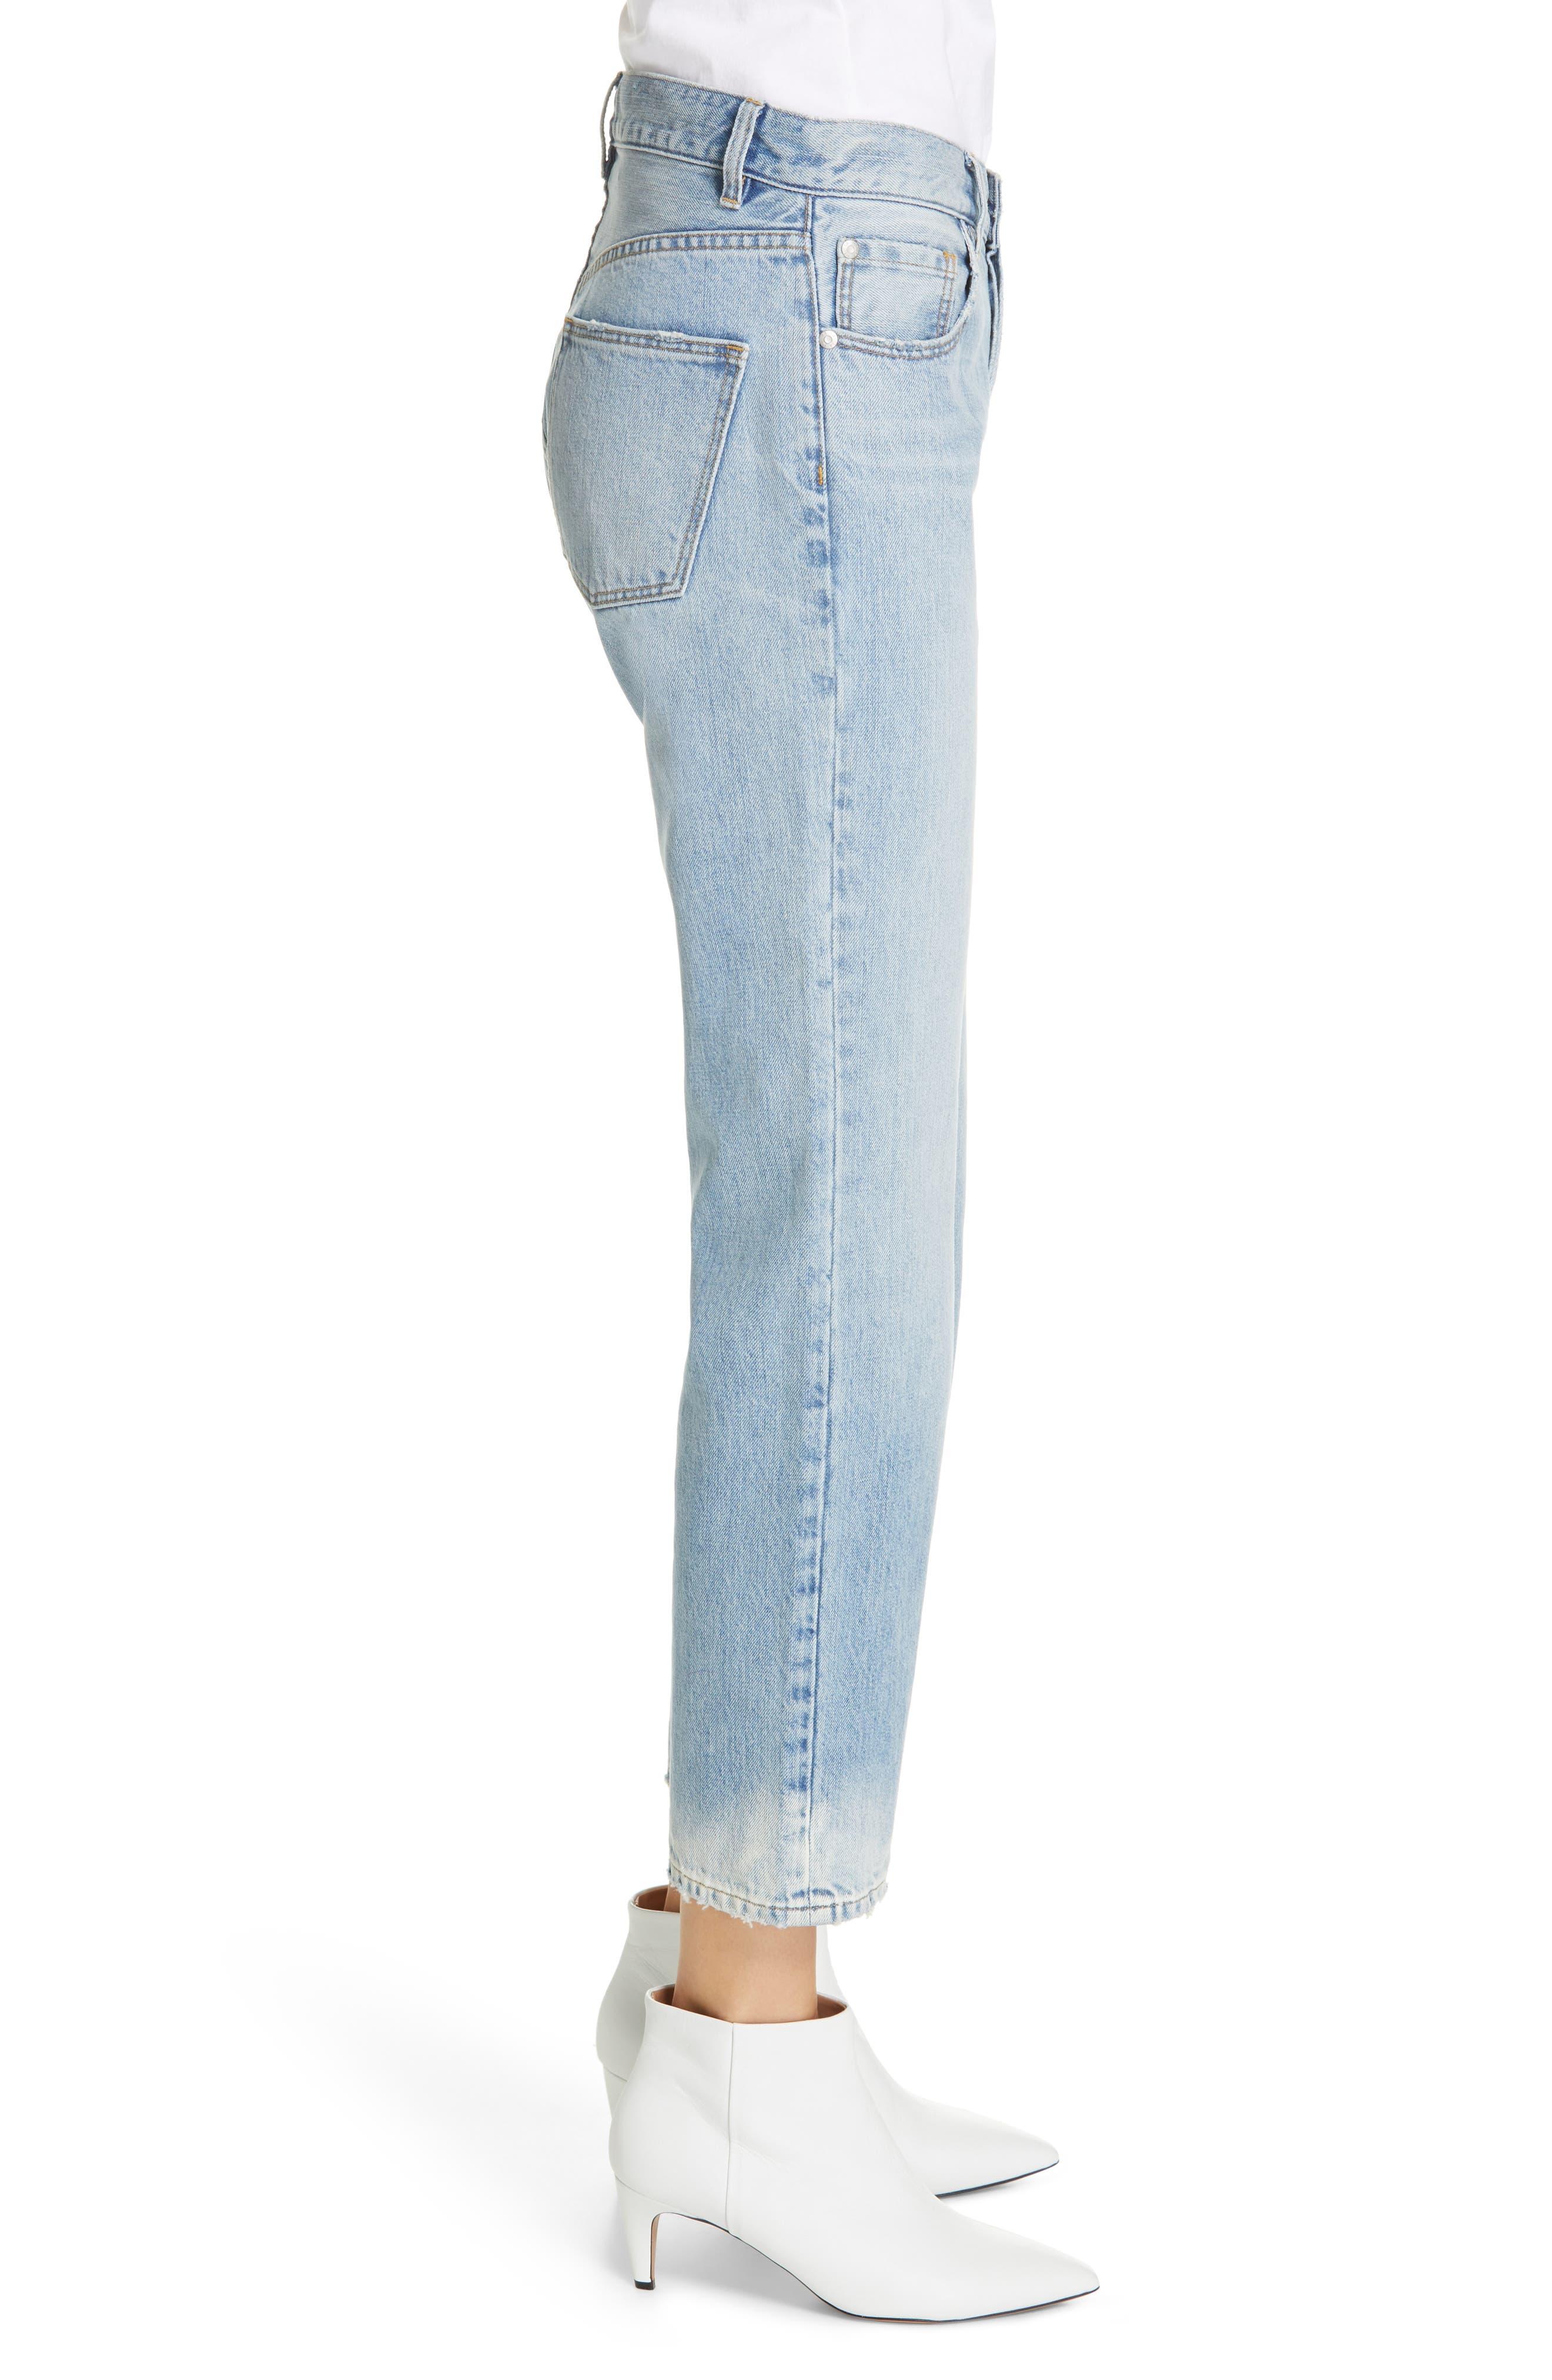 LA VIE REBECCA TAYLOR, Sylvie High Waist Jeans, Alternate thumbnail 4, color, CHANTAL WASH